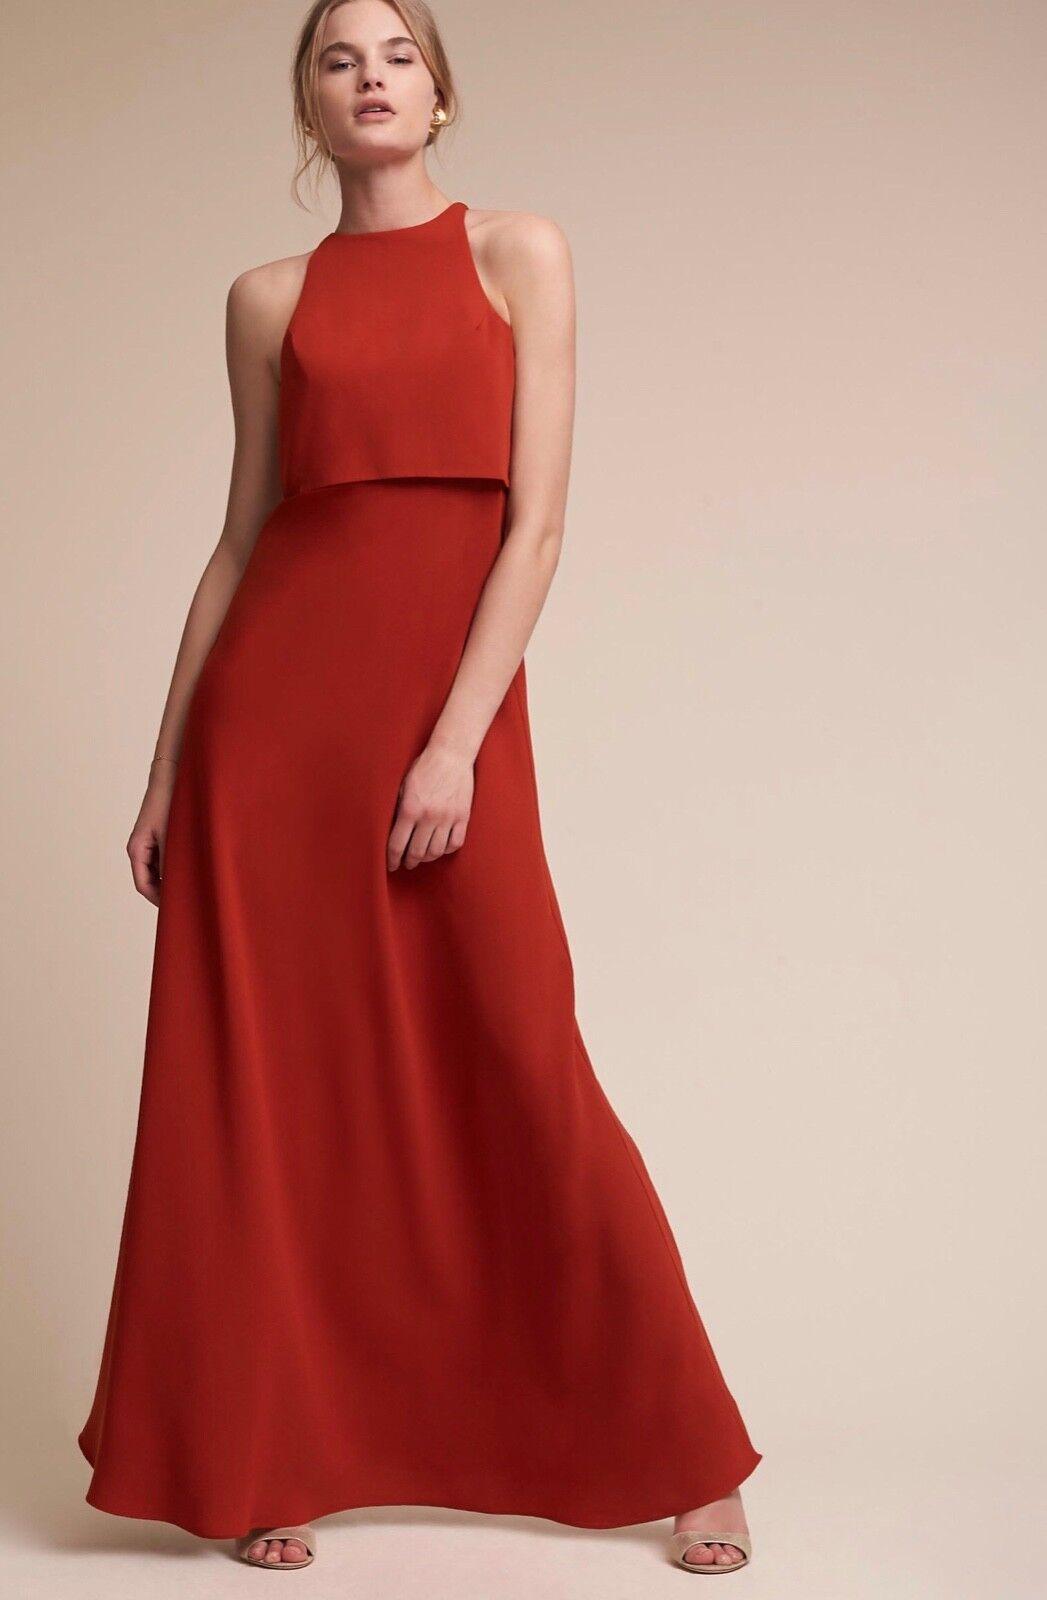 NWT NWT NWT  298 BHLDN Jill Stuart Iva Crepe Maxi Dress Size 10 Spice e14c9a